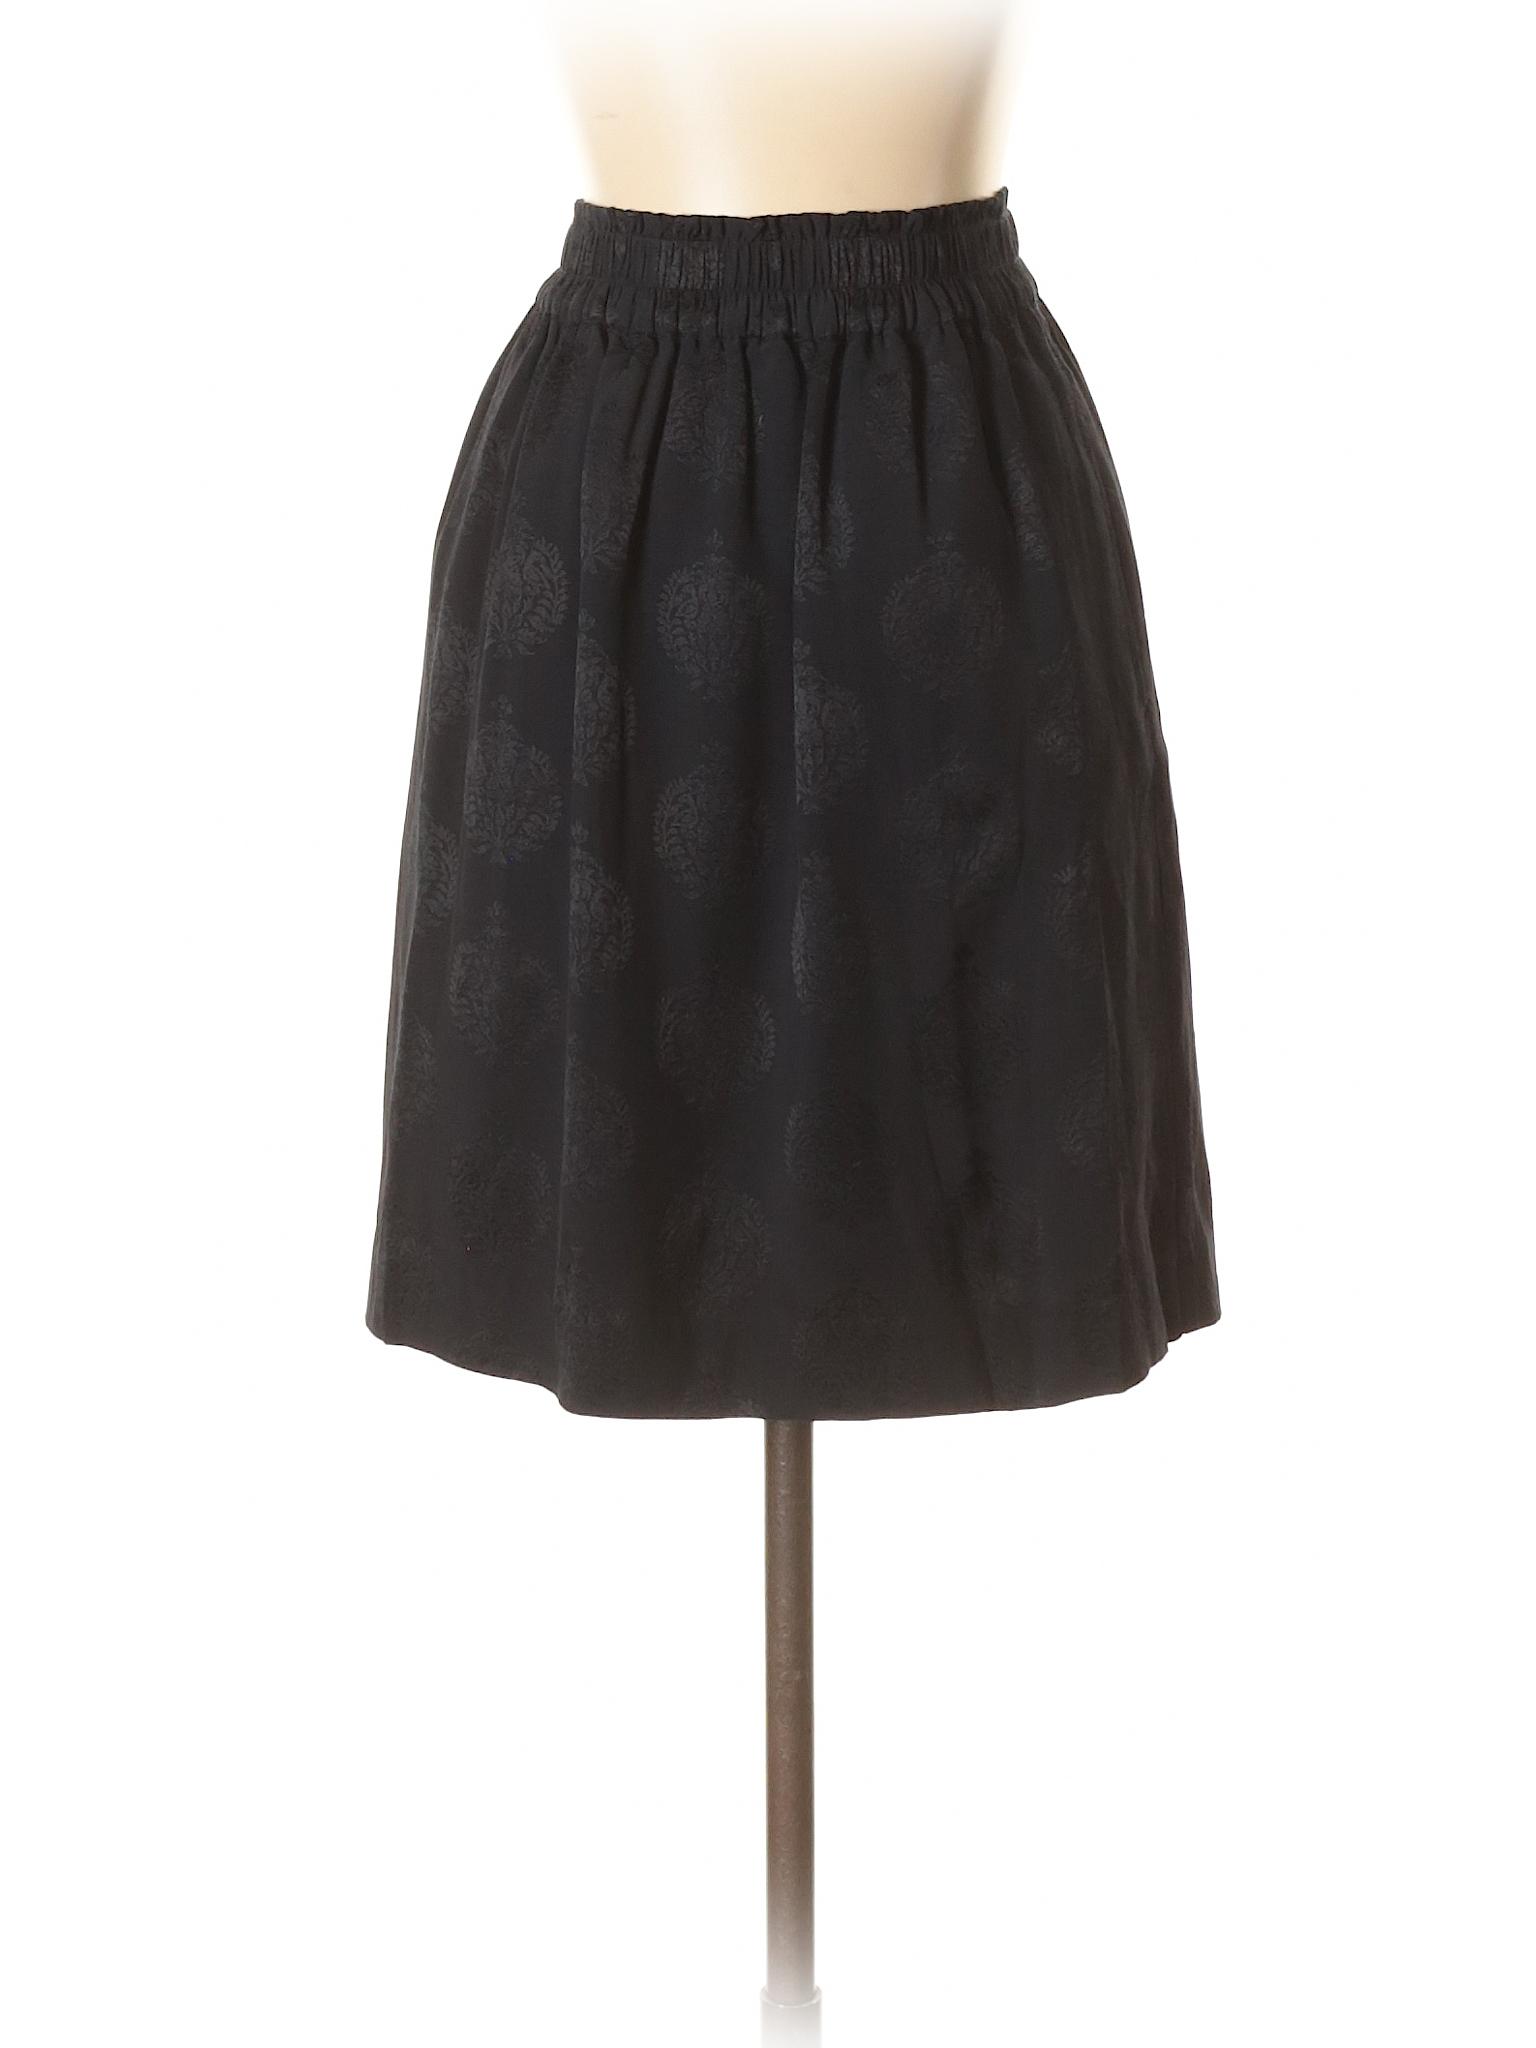 LOFT Leisure Casual Taylor Skirt winter Ann 7vtPq8w